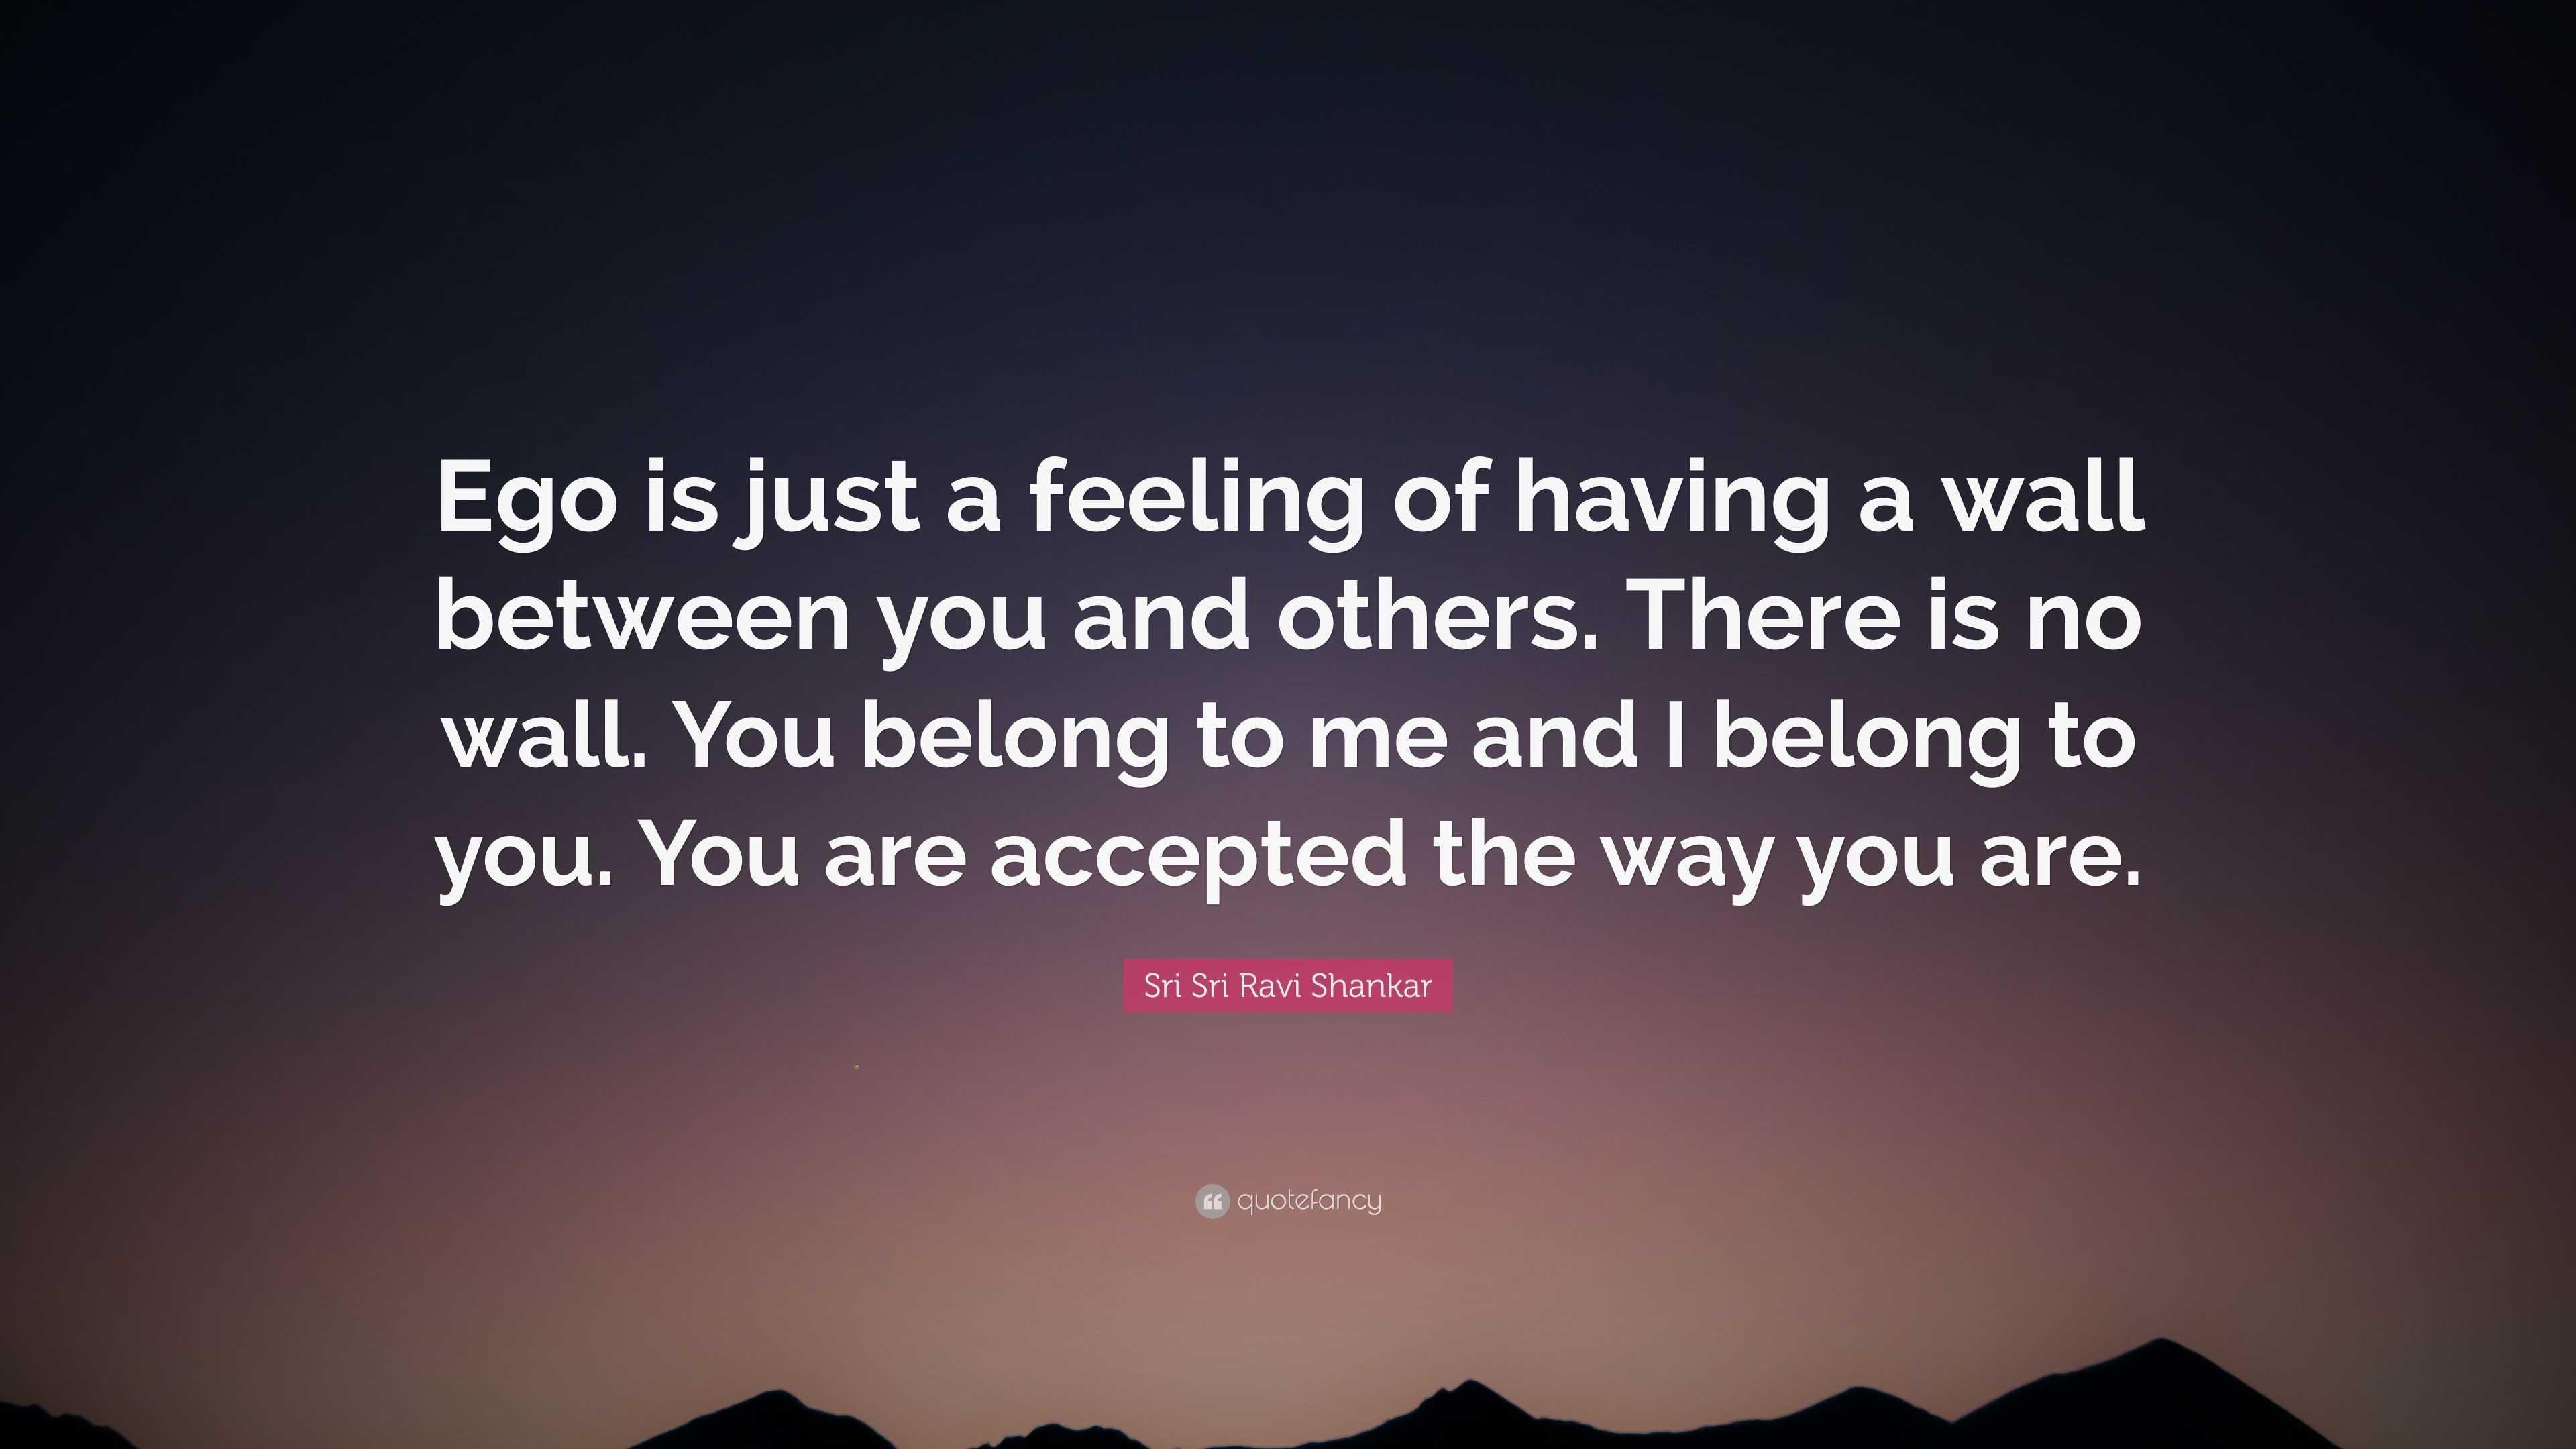 Sri Sri Ravi Shankar Quote Ego Is Just A Feeling Of Having A Wall